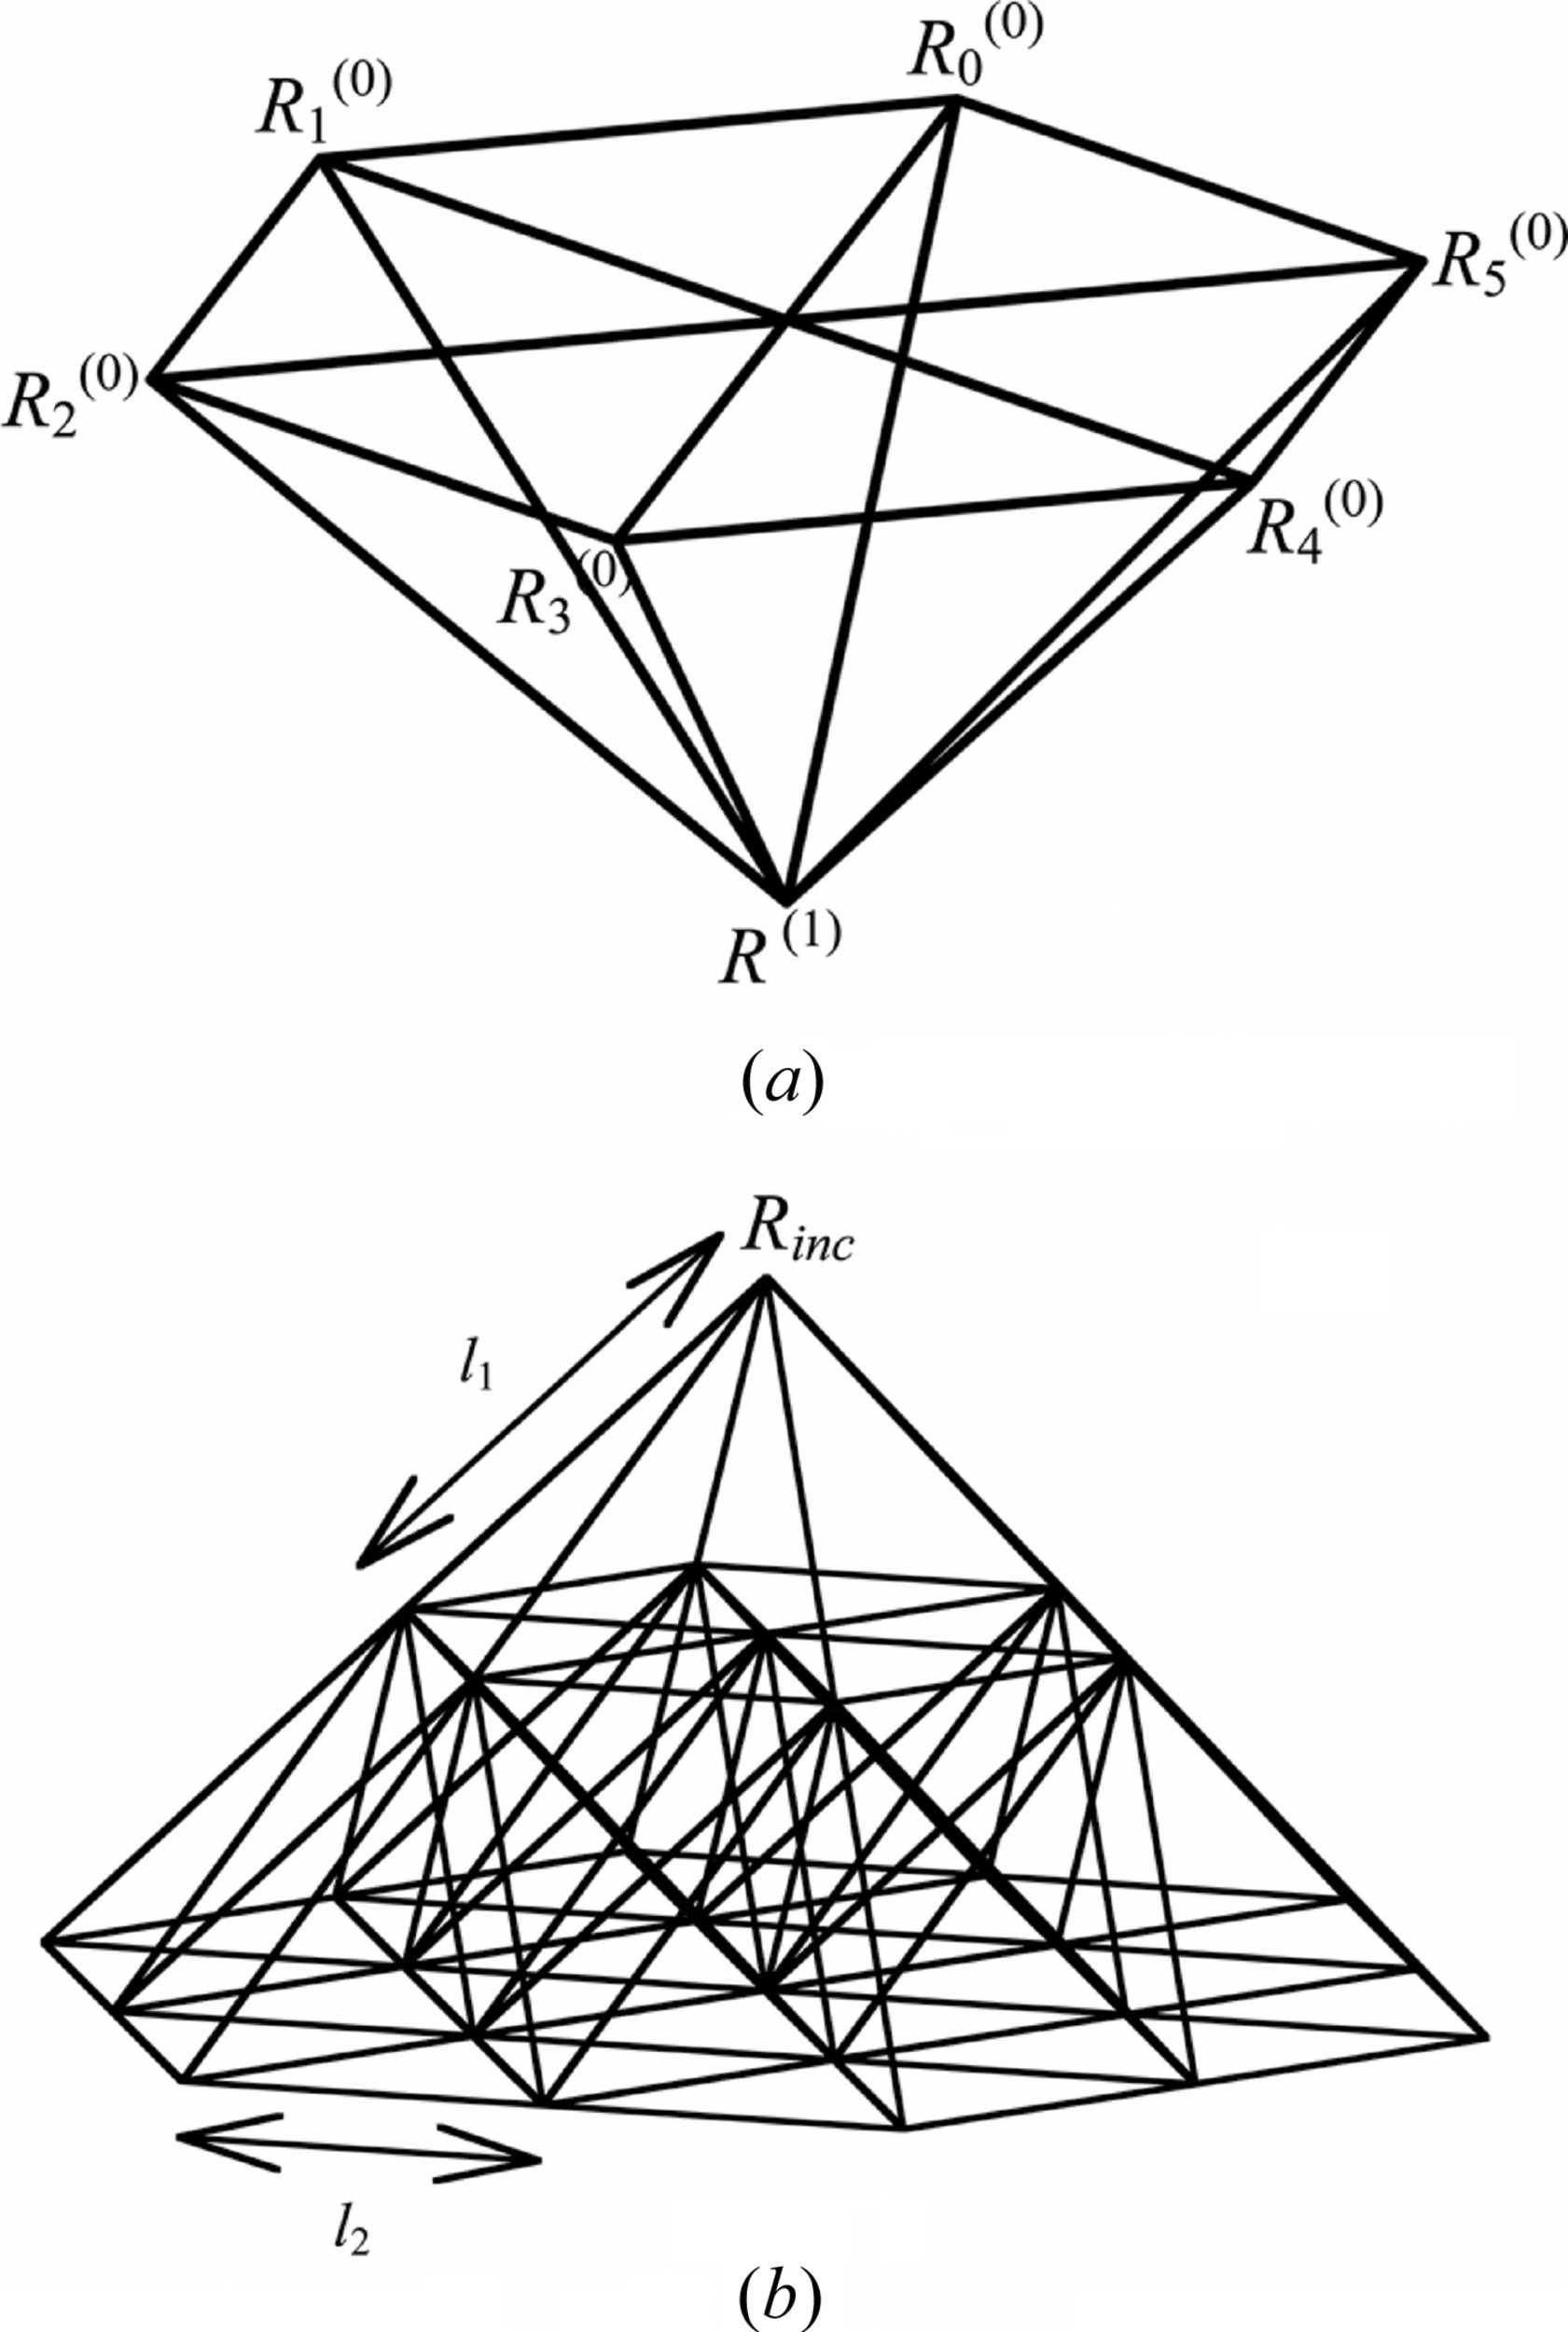 iucr polarization dependent six beam x ray pinhole topographs I Beam Lamp iucr polarization dependent six beam x ray pinhole topographs